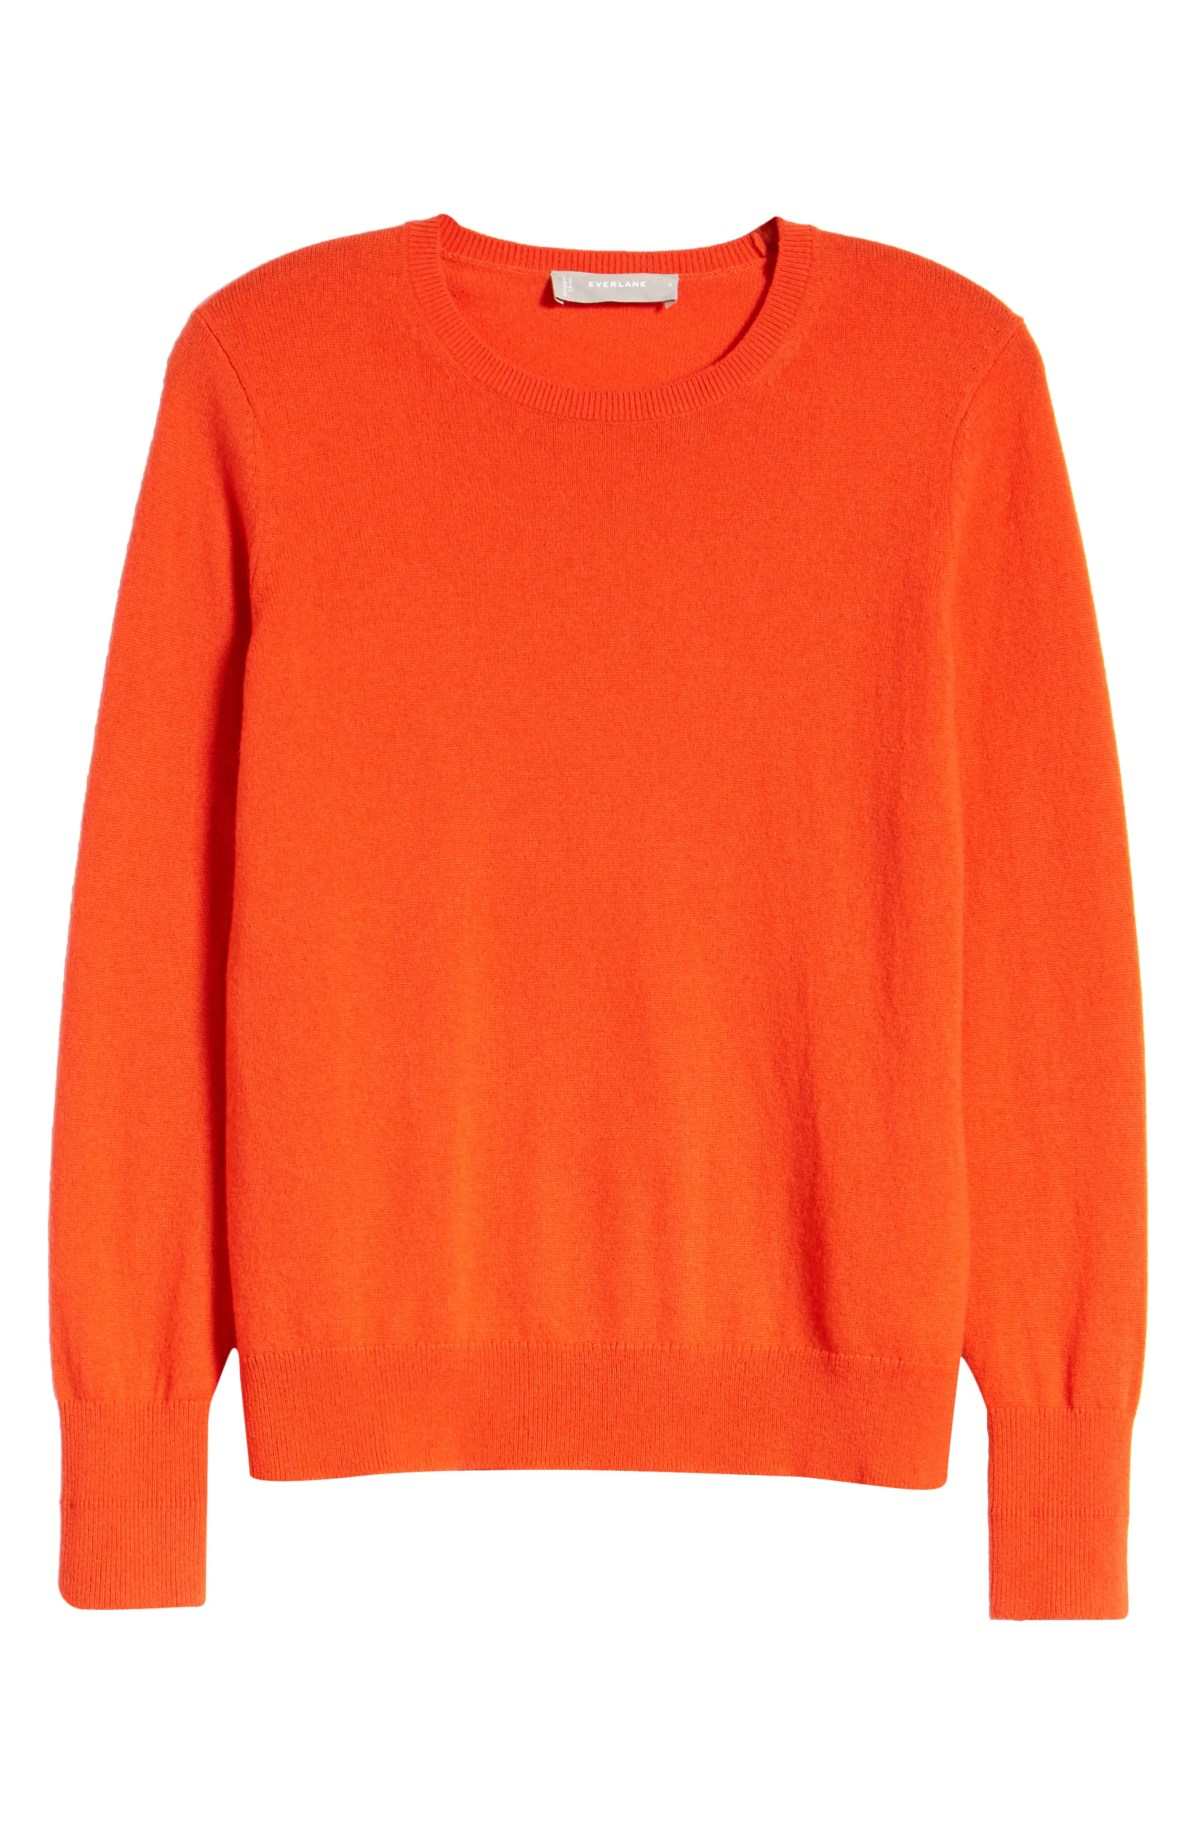 EVERLANE The Cashmere Crew Sweater, Main, color, PERSIMMON